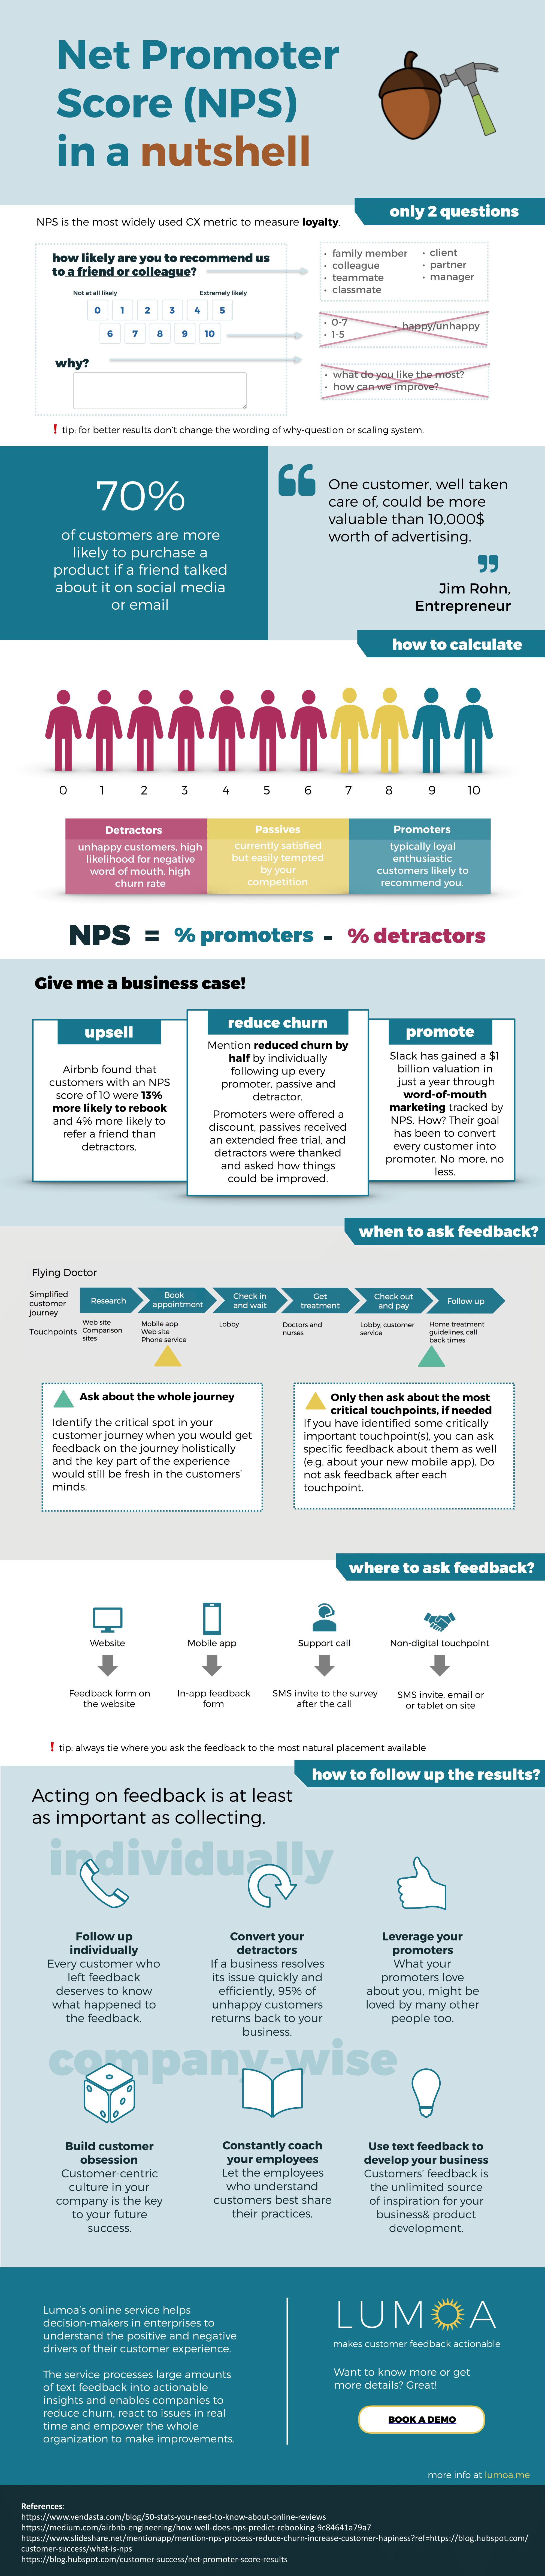 Net Promoter Score Definition [Infographic]